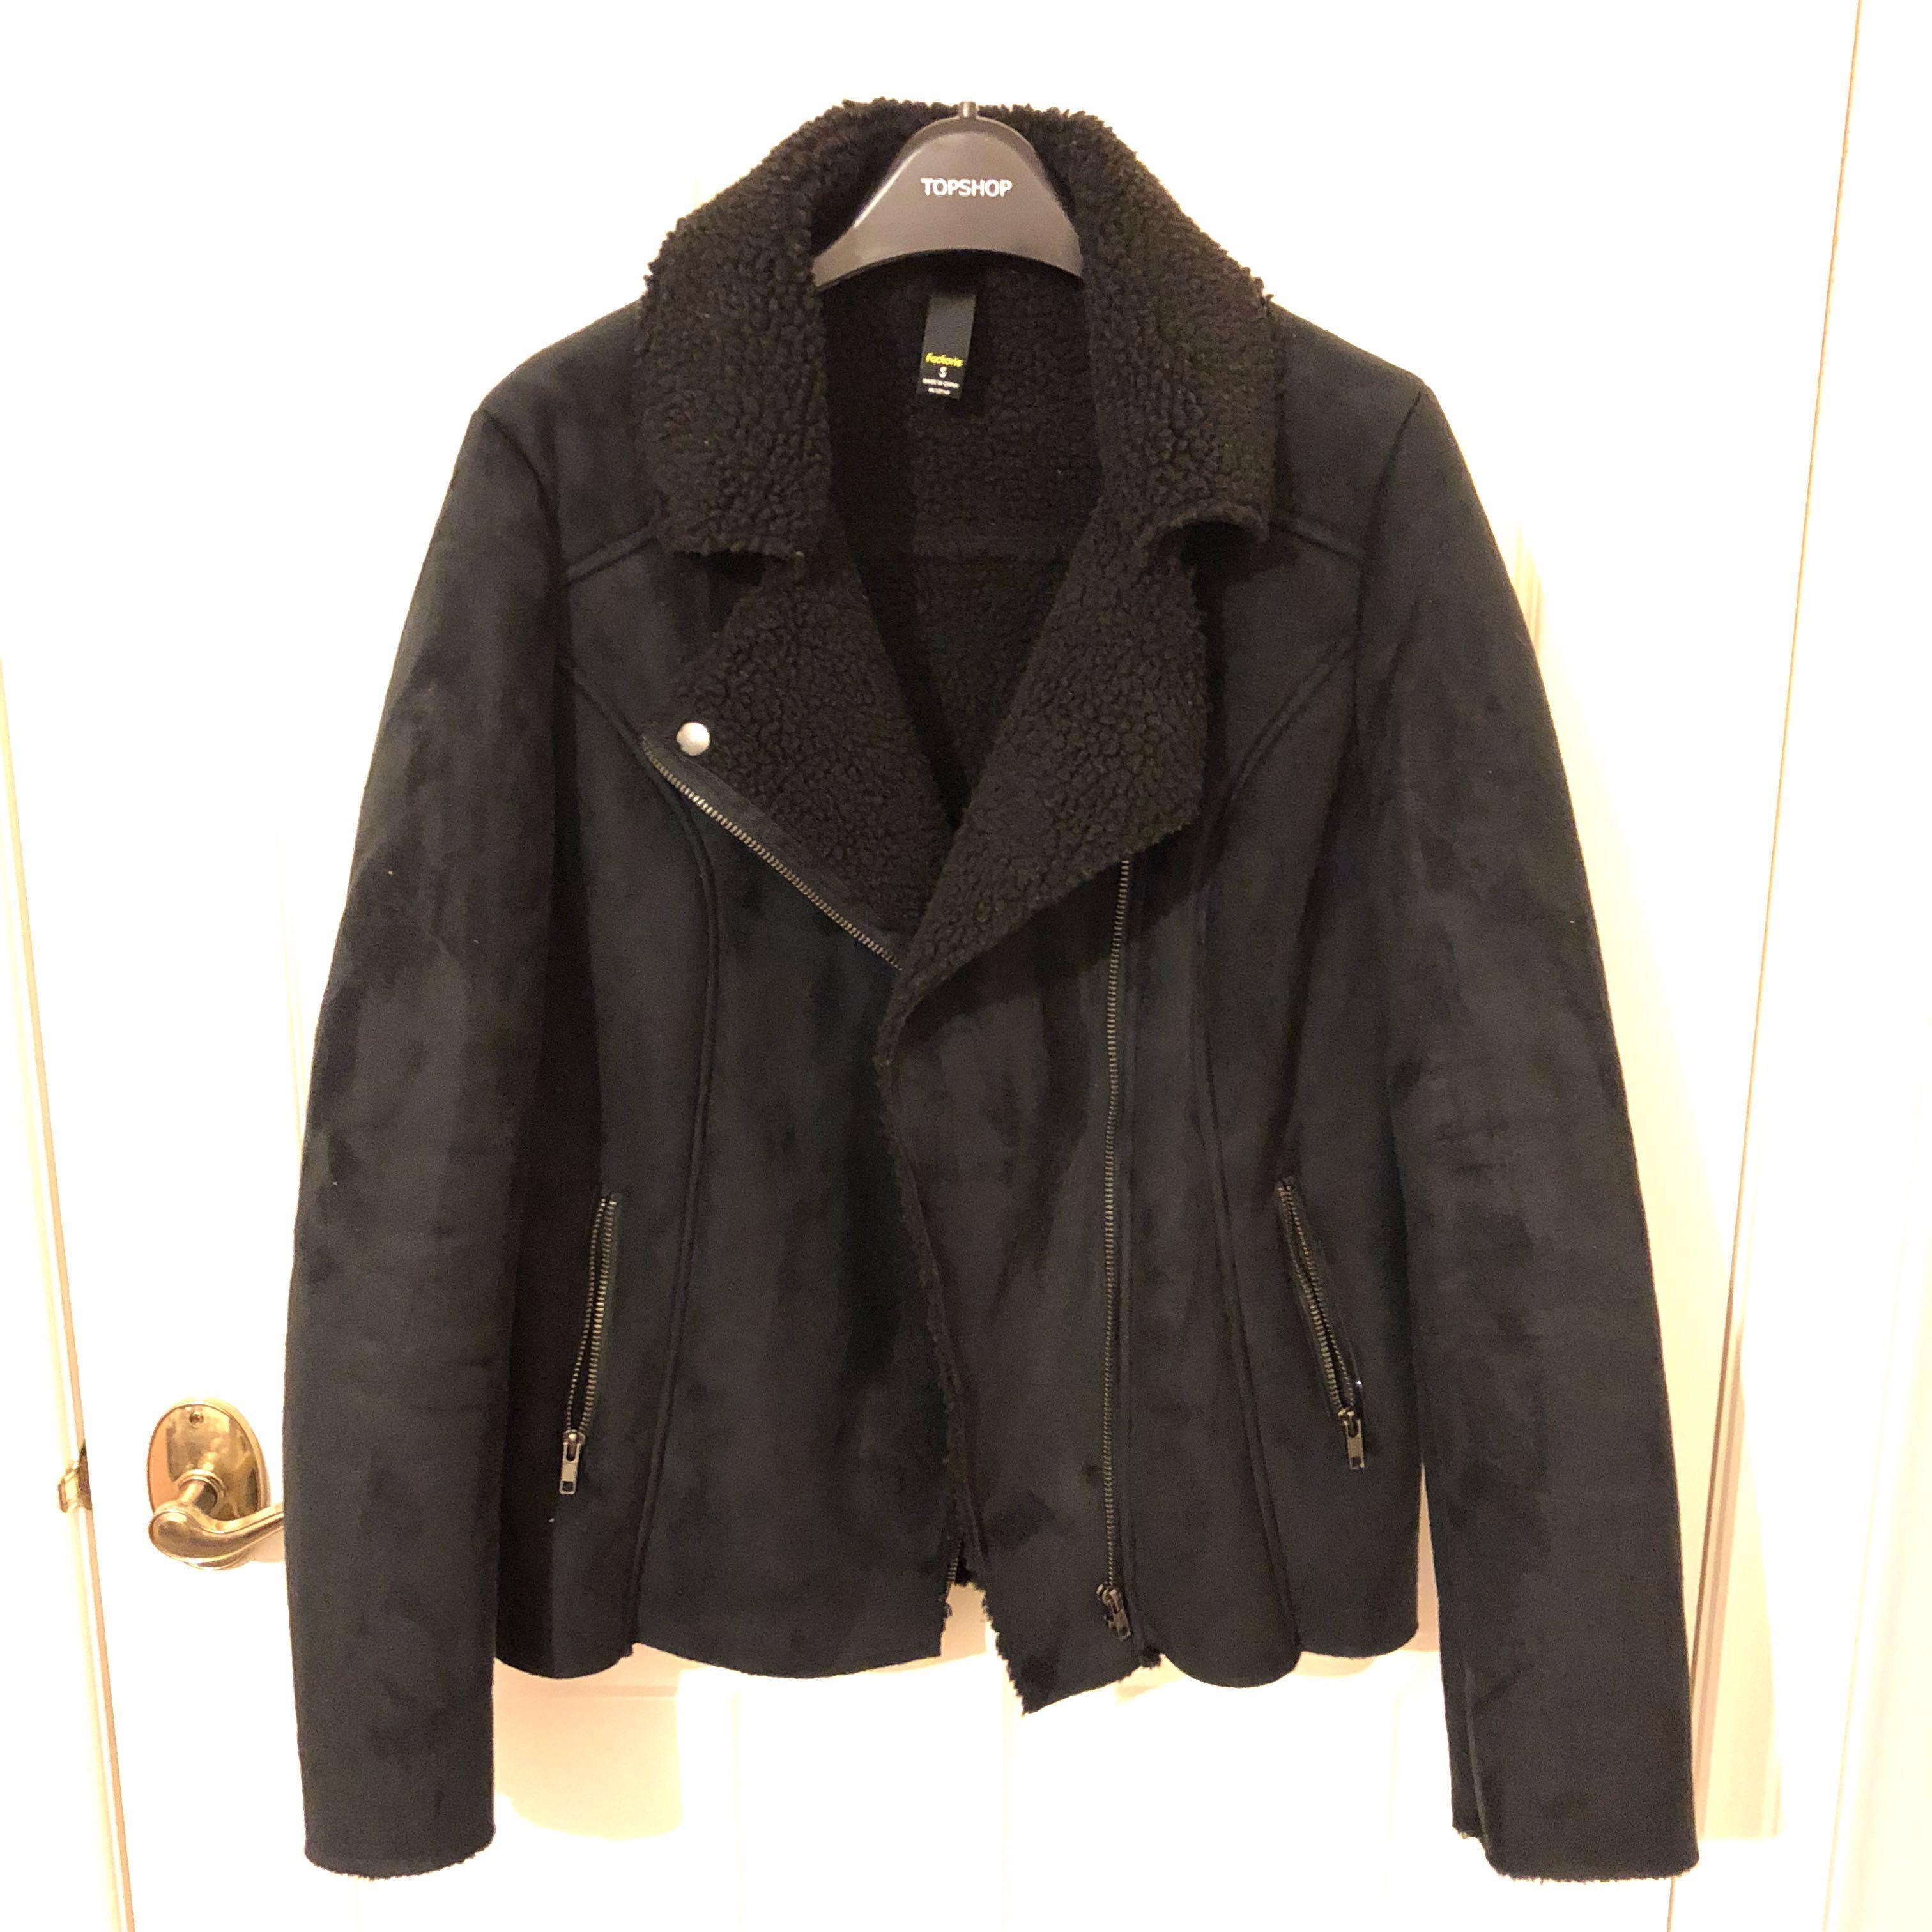 Warm black jacket